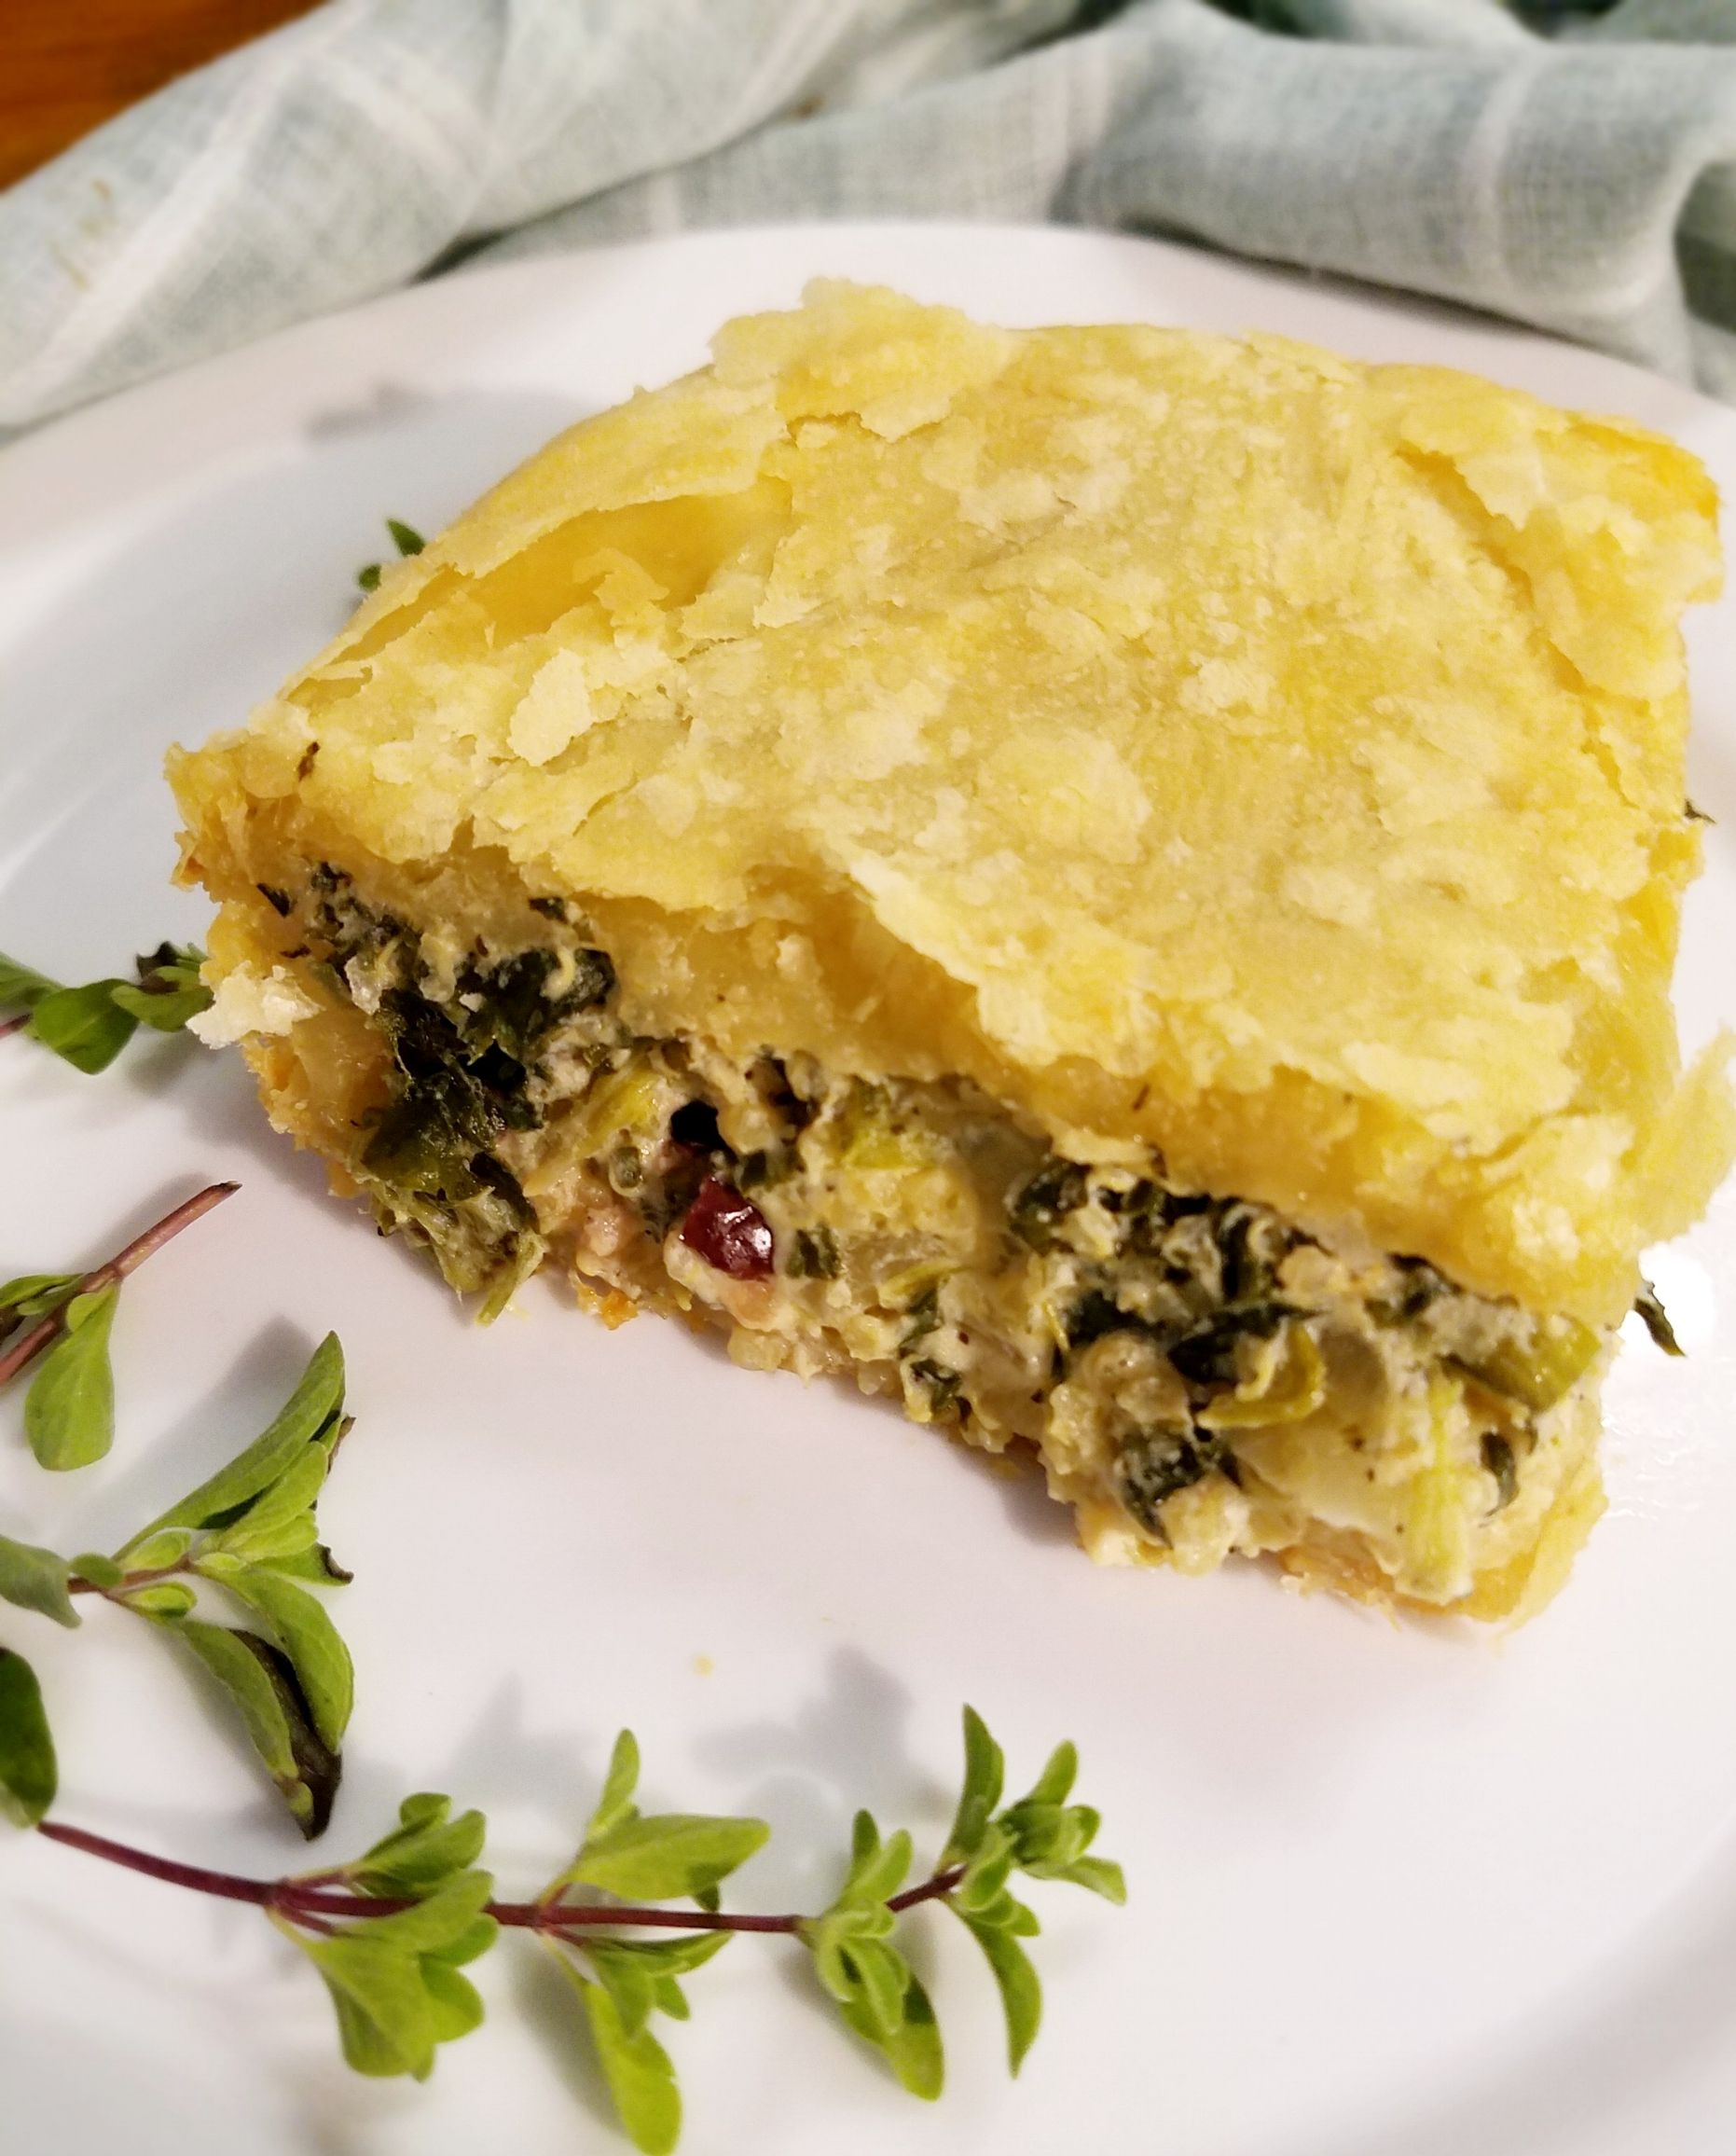 Vegan Greek Spinach Pastry Food Glorious Food Vegan